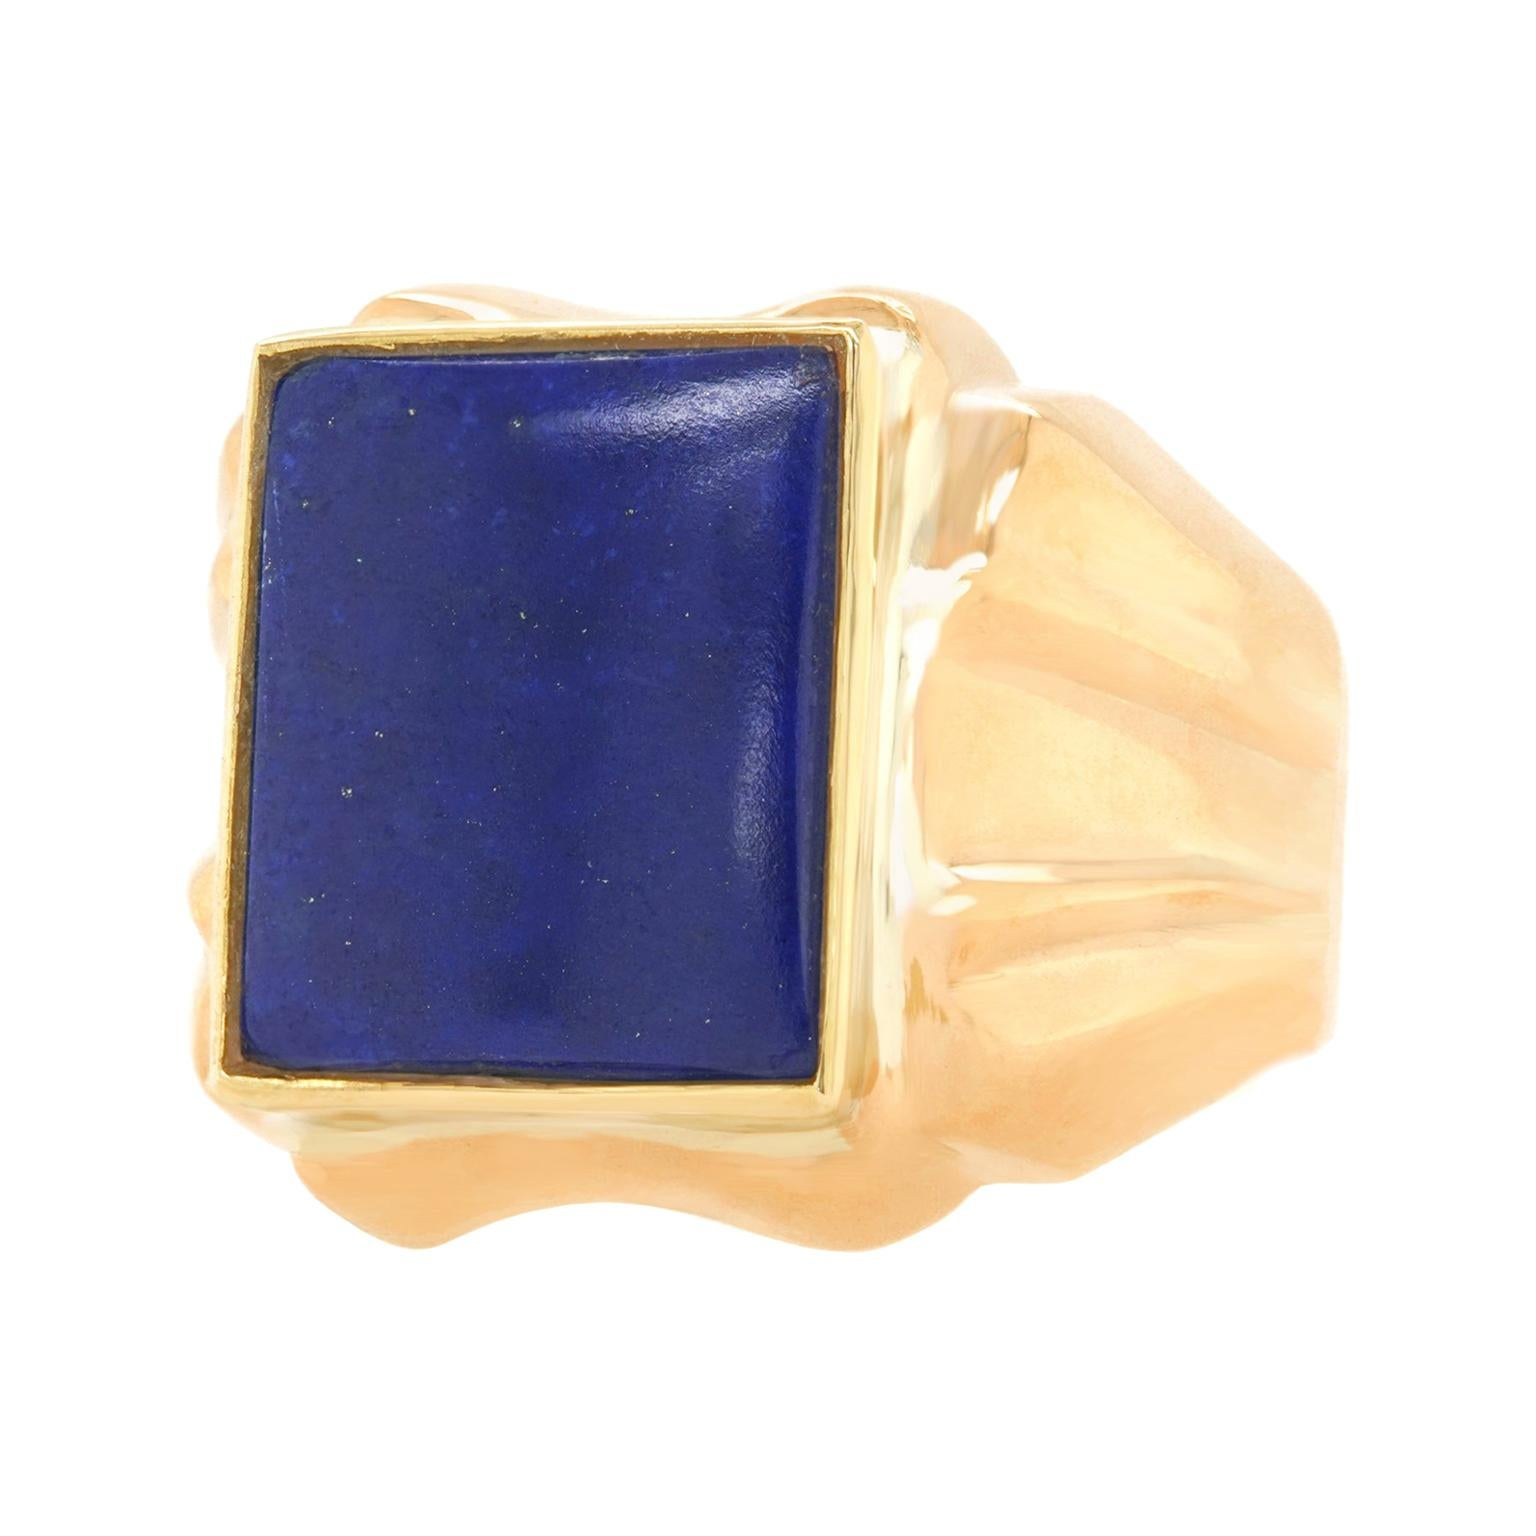 Seventies Lapis Signet Ring